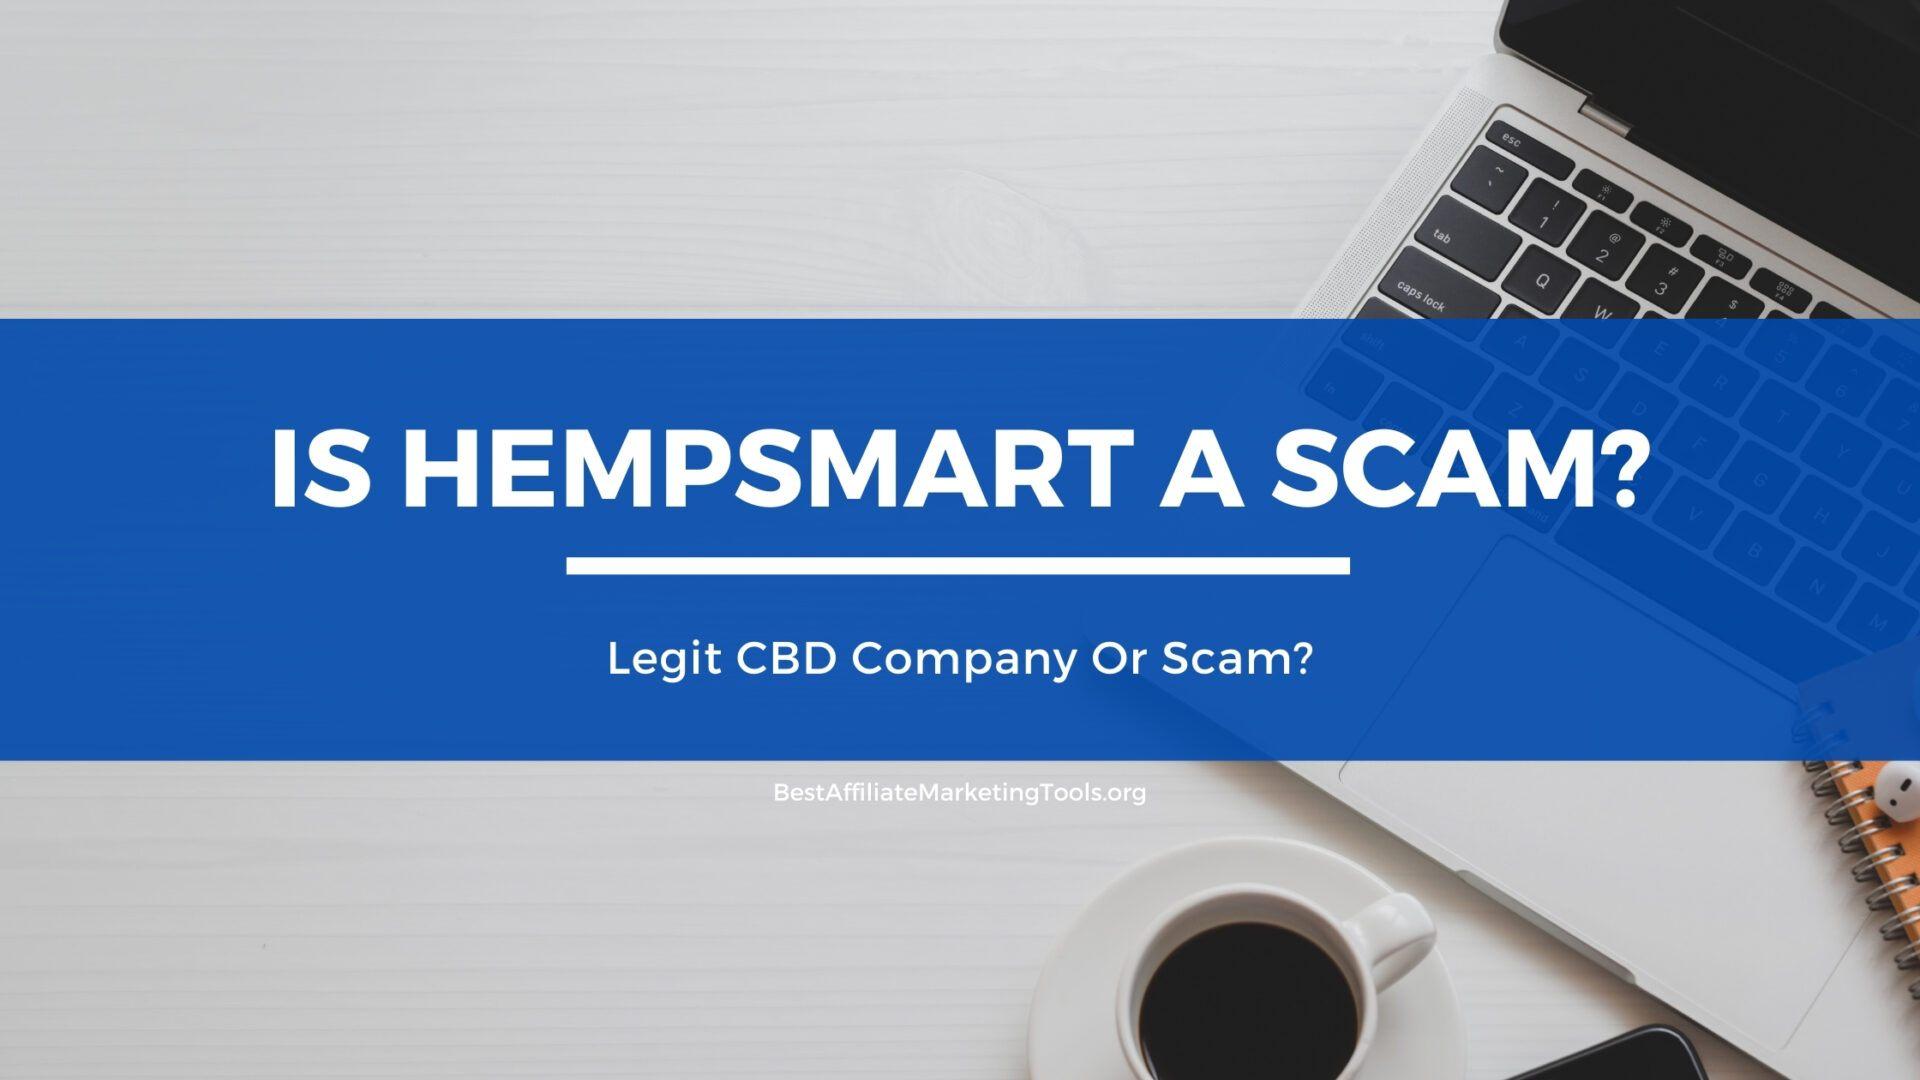 Is hempSMART a Scam